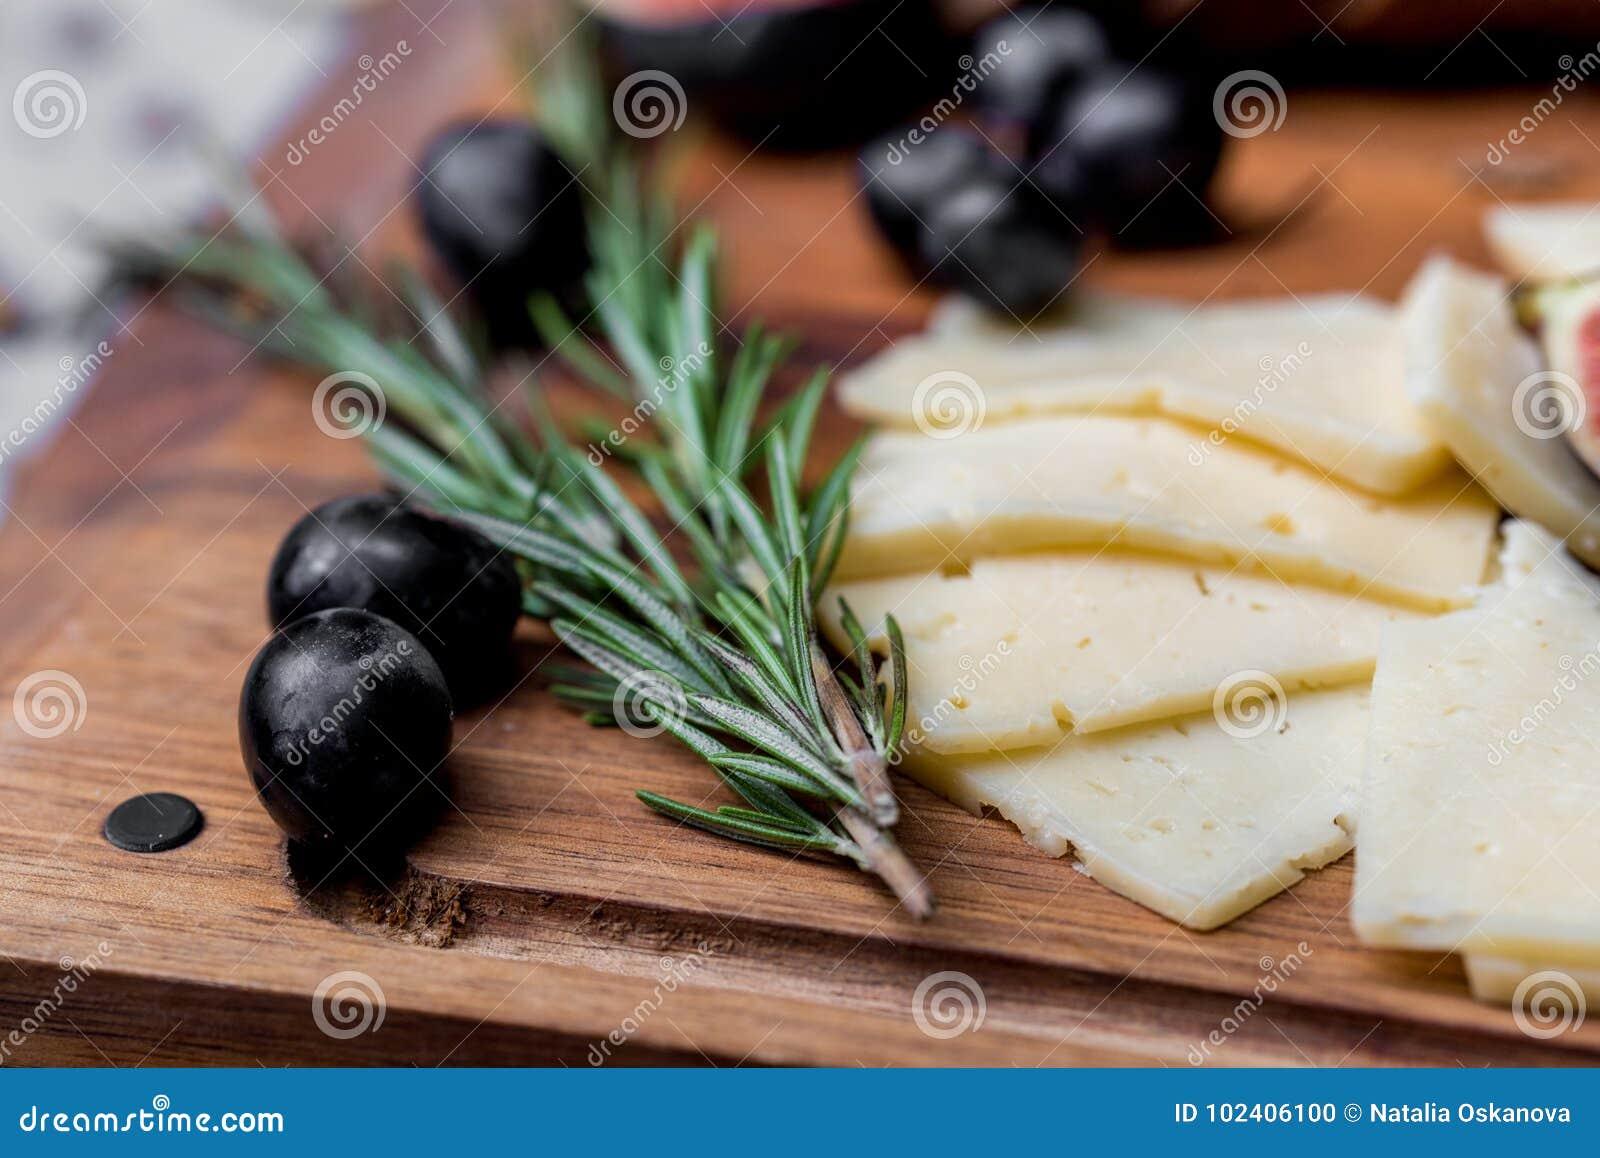 Rebanadas de queso, de aceitunas y de romero a bordo